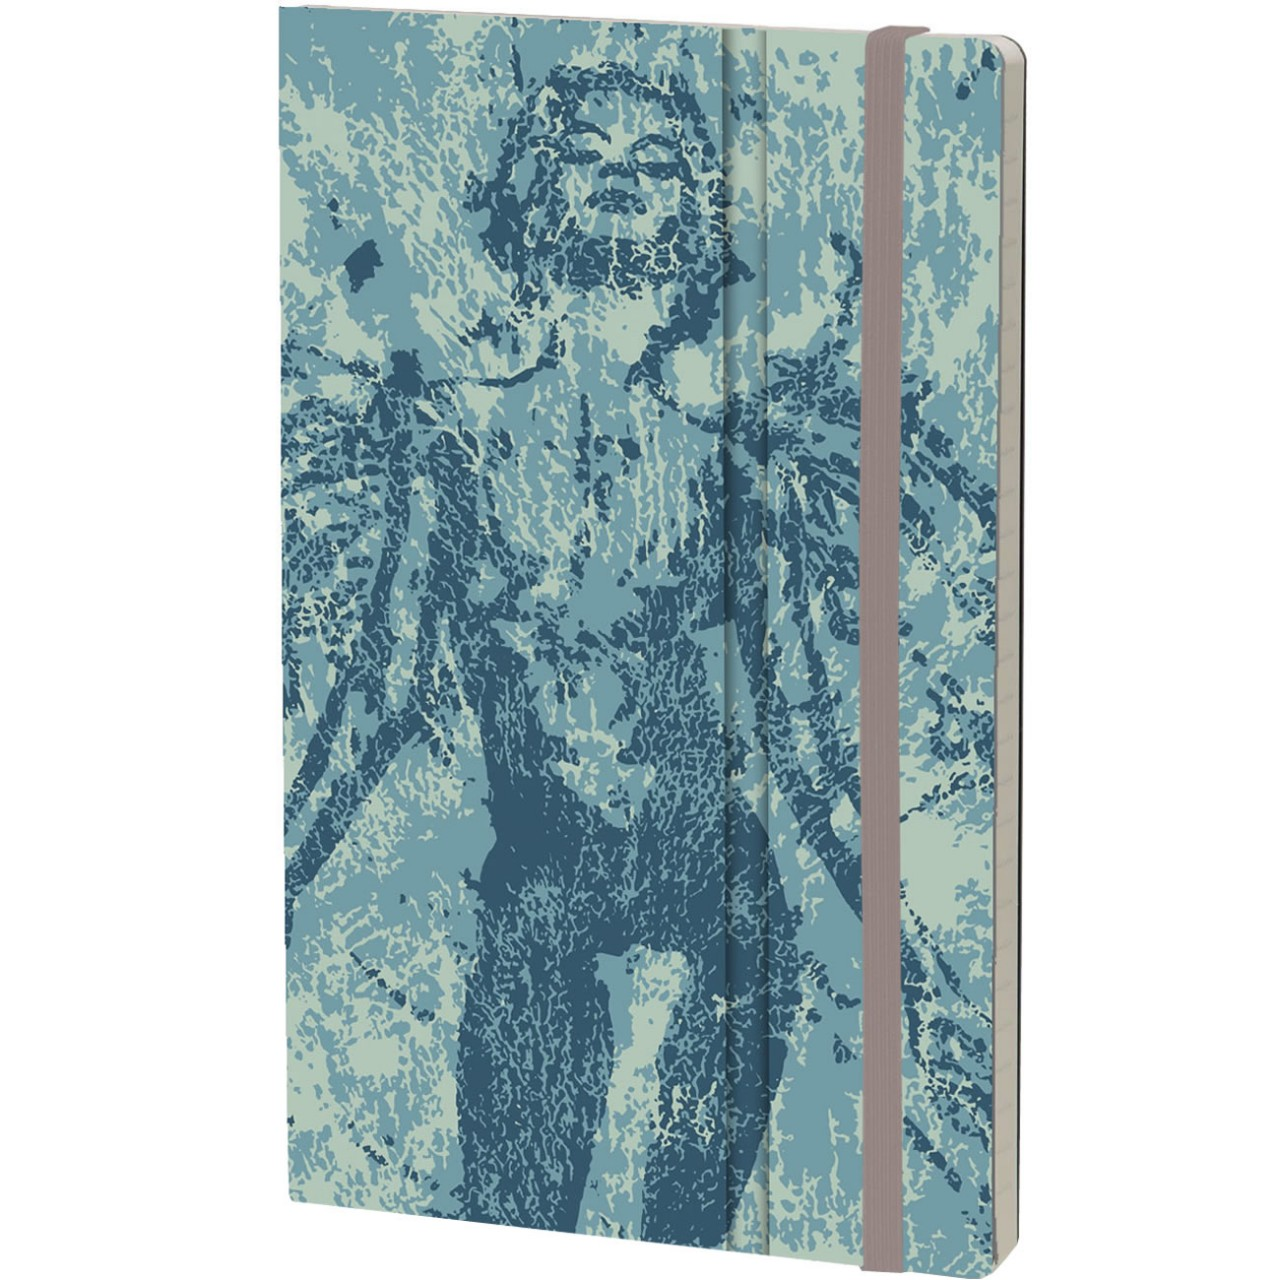 Stifflex Notizbuch PAINT - FRAGMENTATION 13 x 21 cm 192 S., ANGELO BLUE